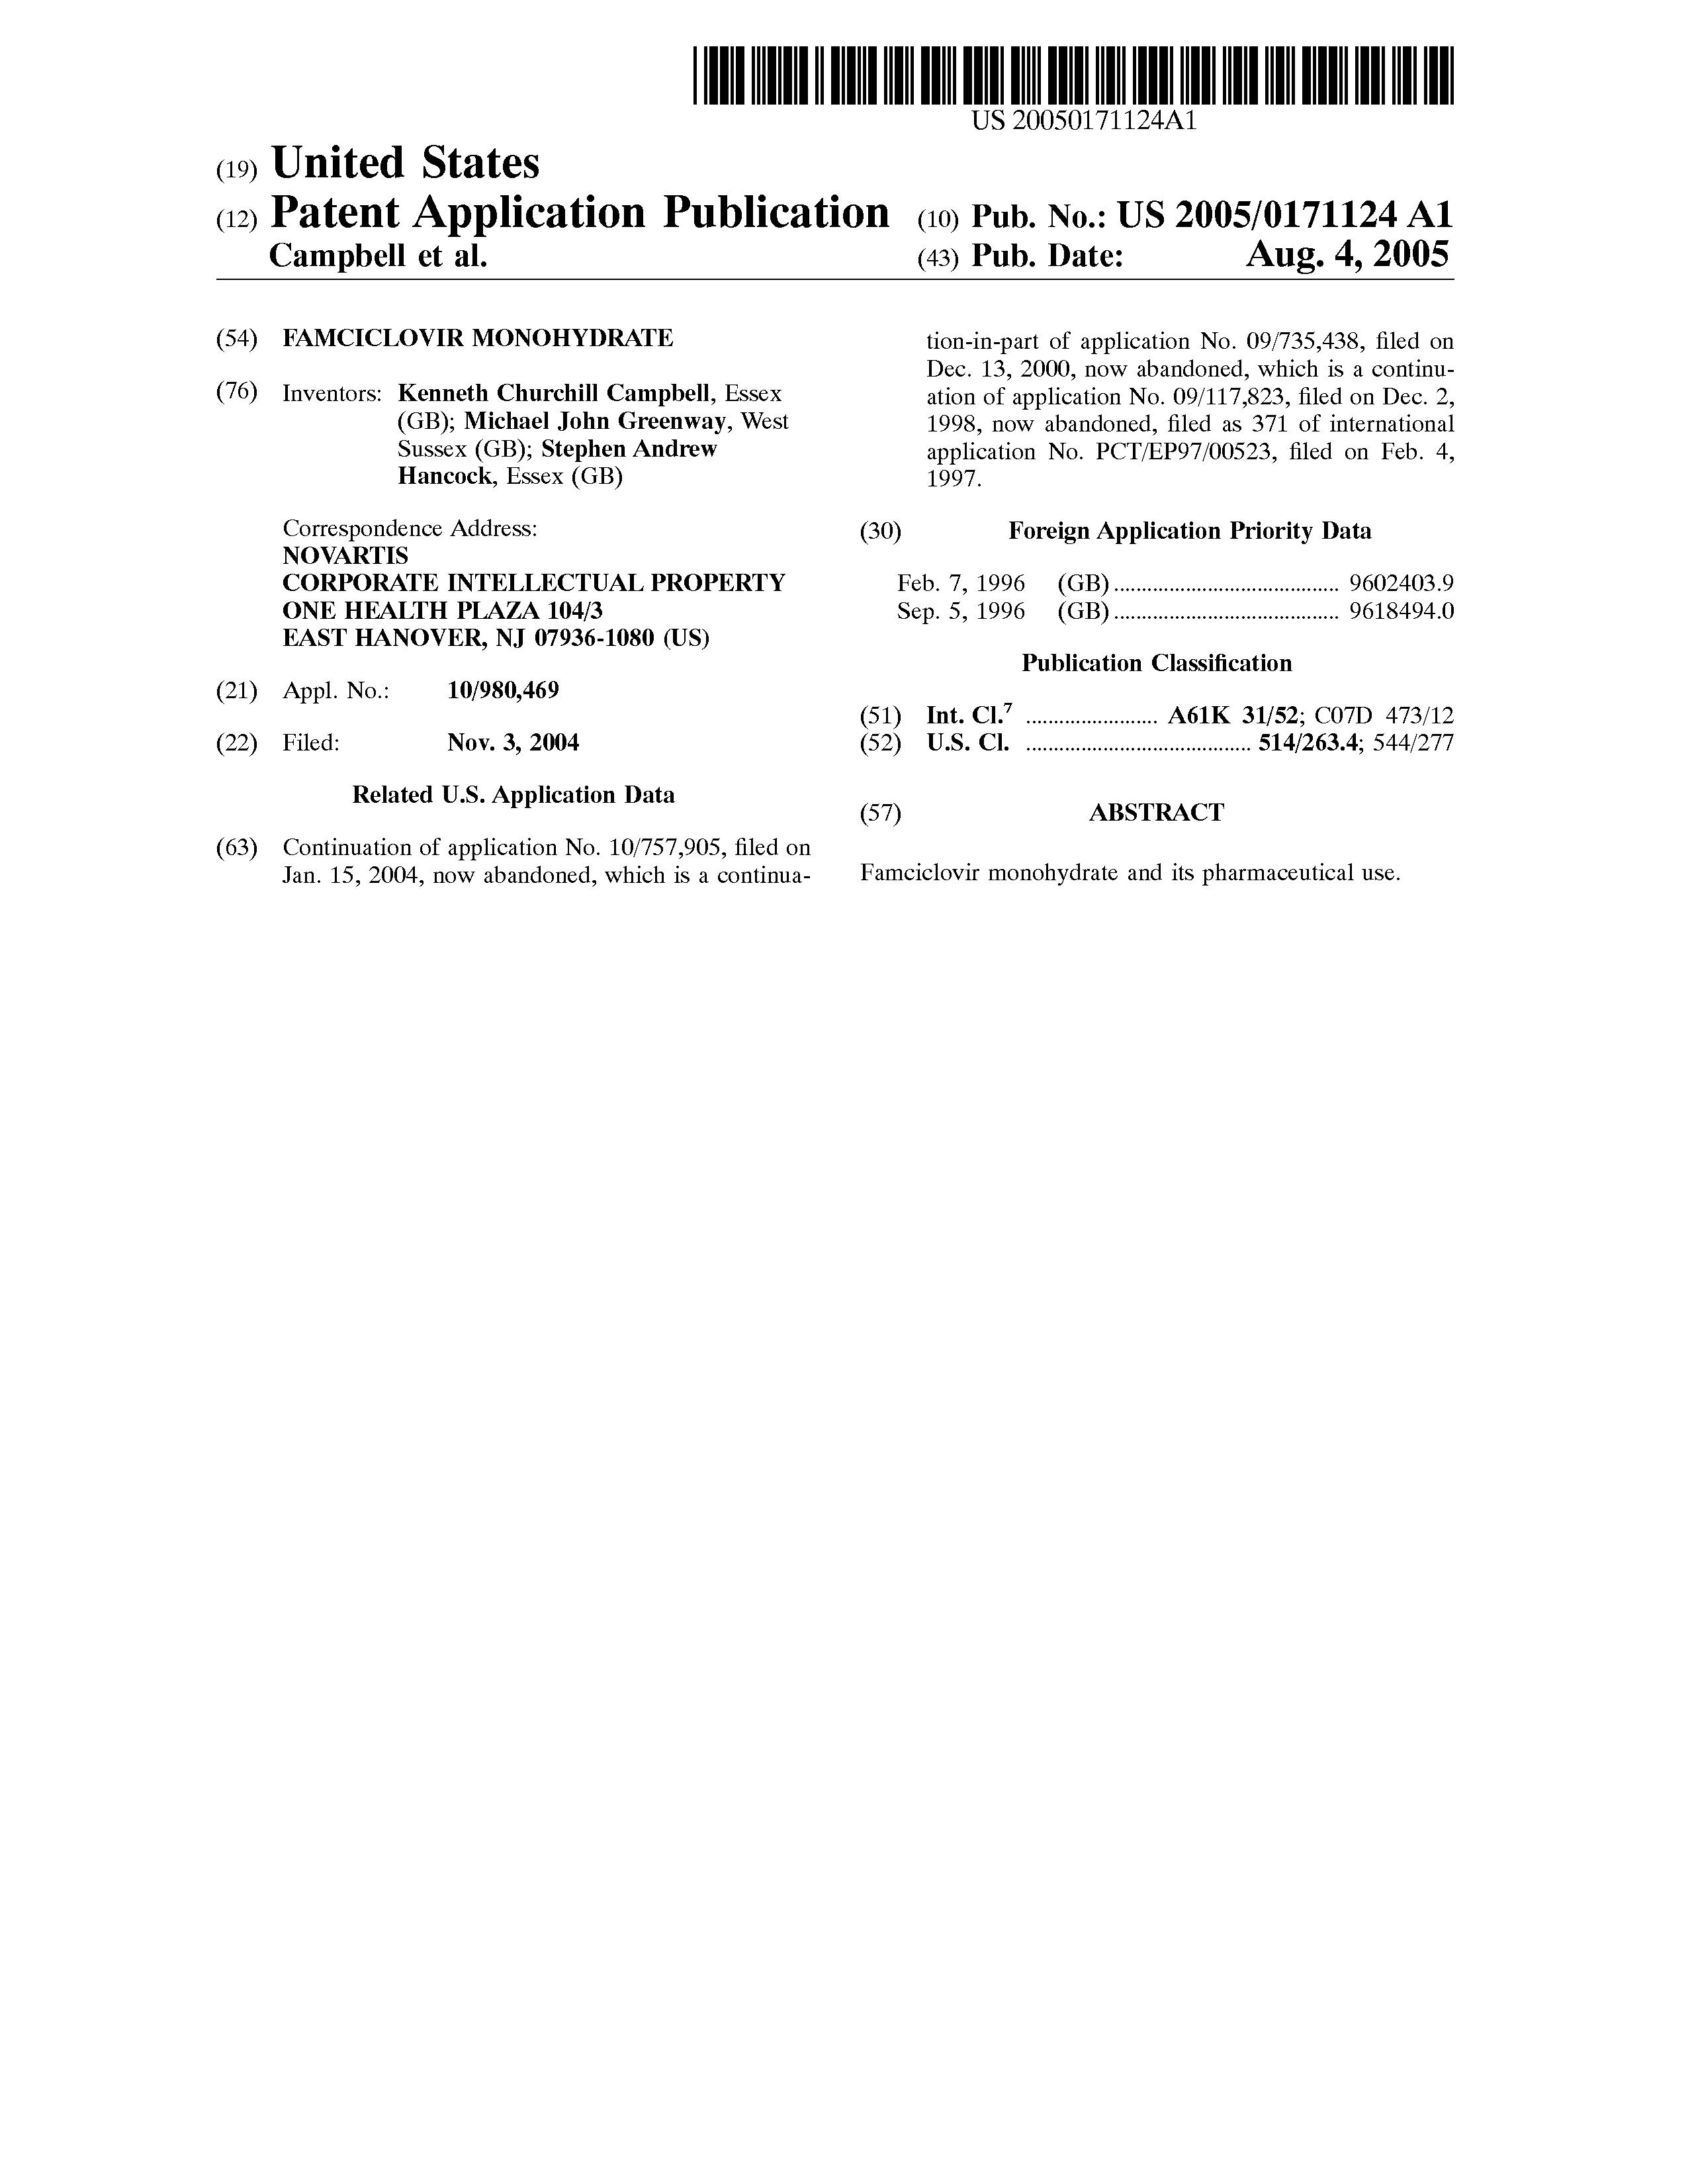 Famciclovir 125 mg.doc - Patent Drawing